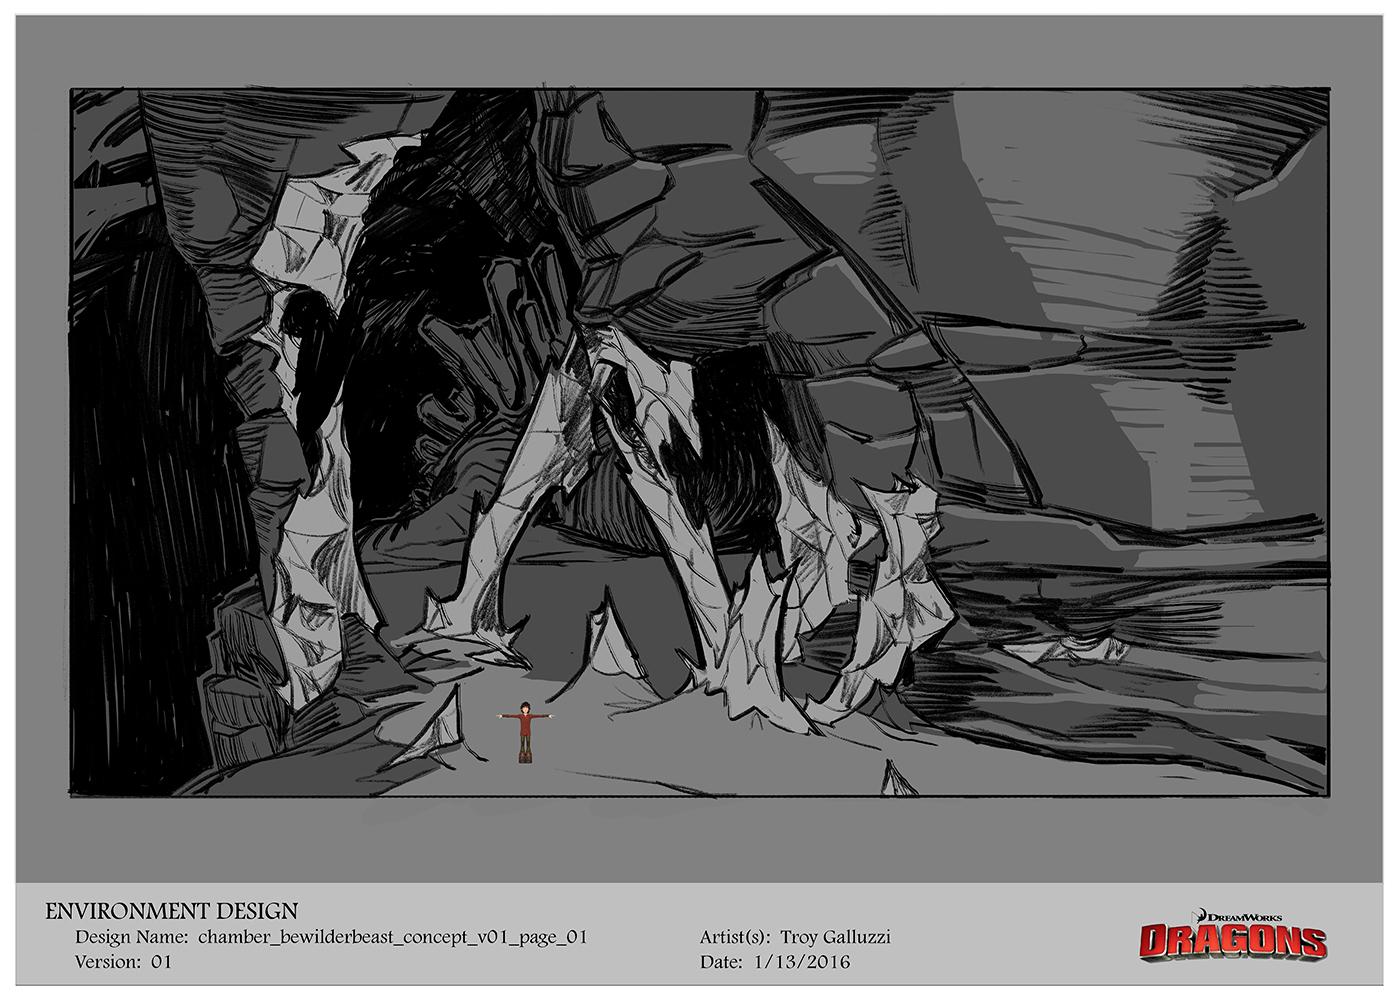 chamber_bewilderbeast_concept_v01_page_01.jpg